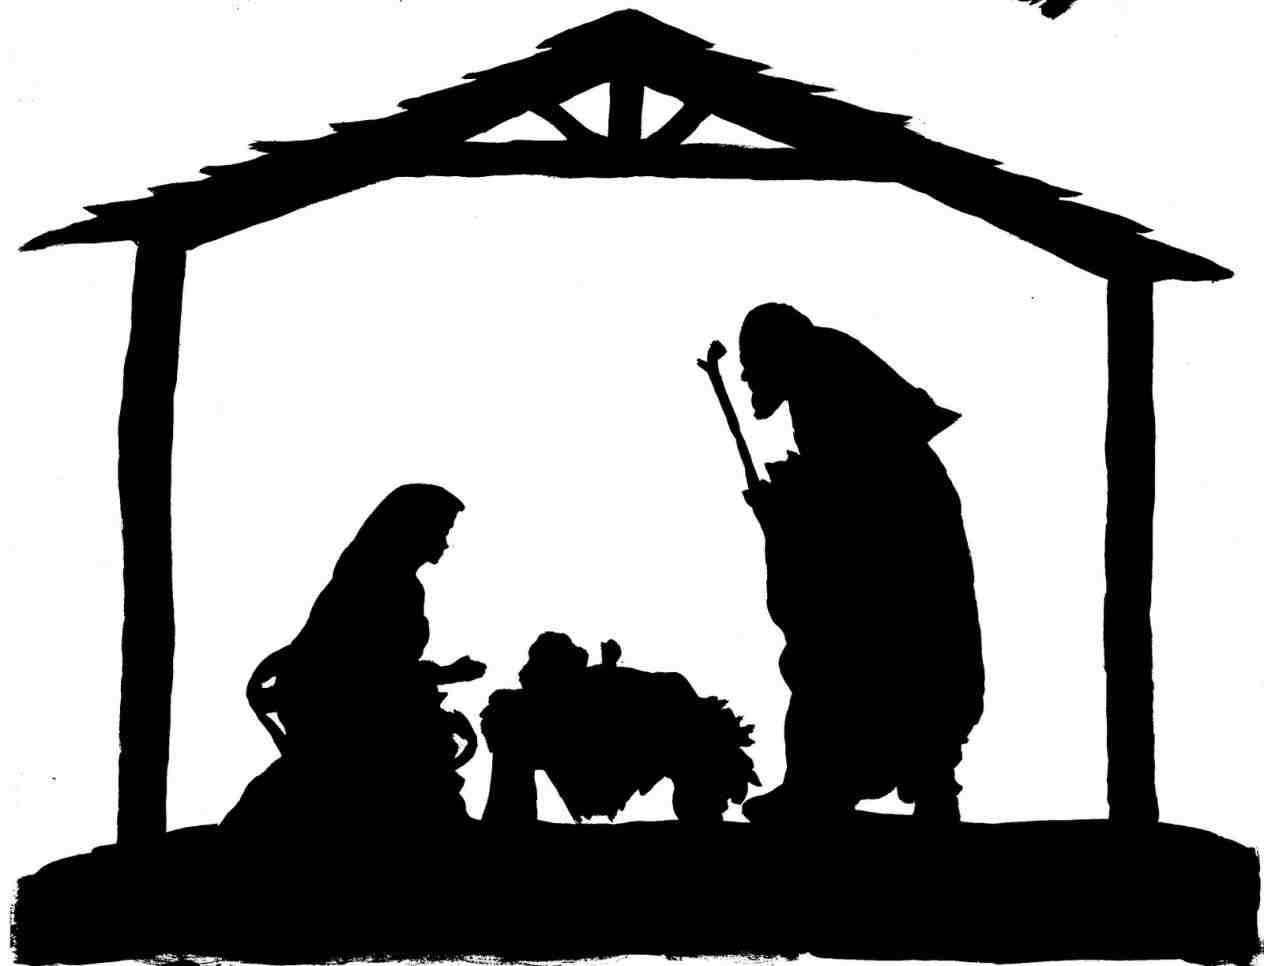 1264x966 Christmas Silhouette Cheminee.website